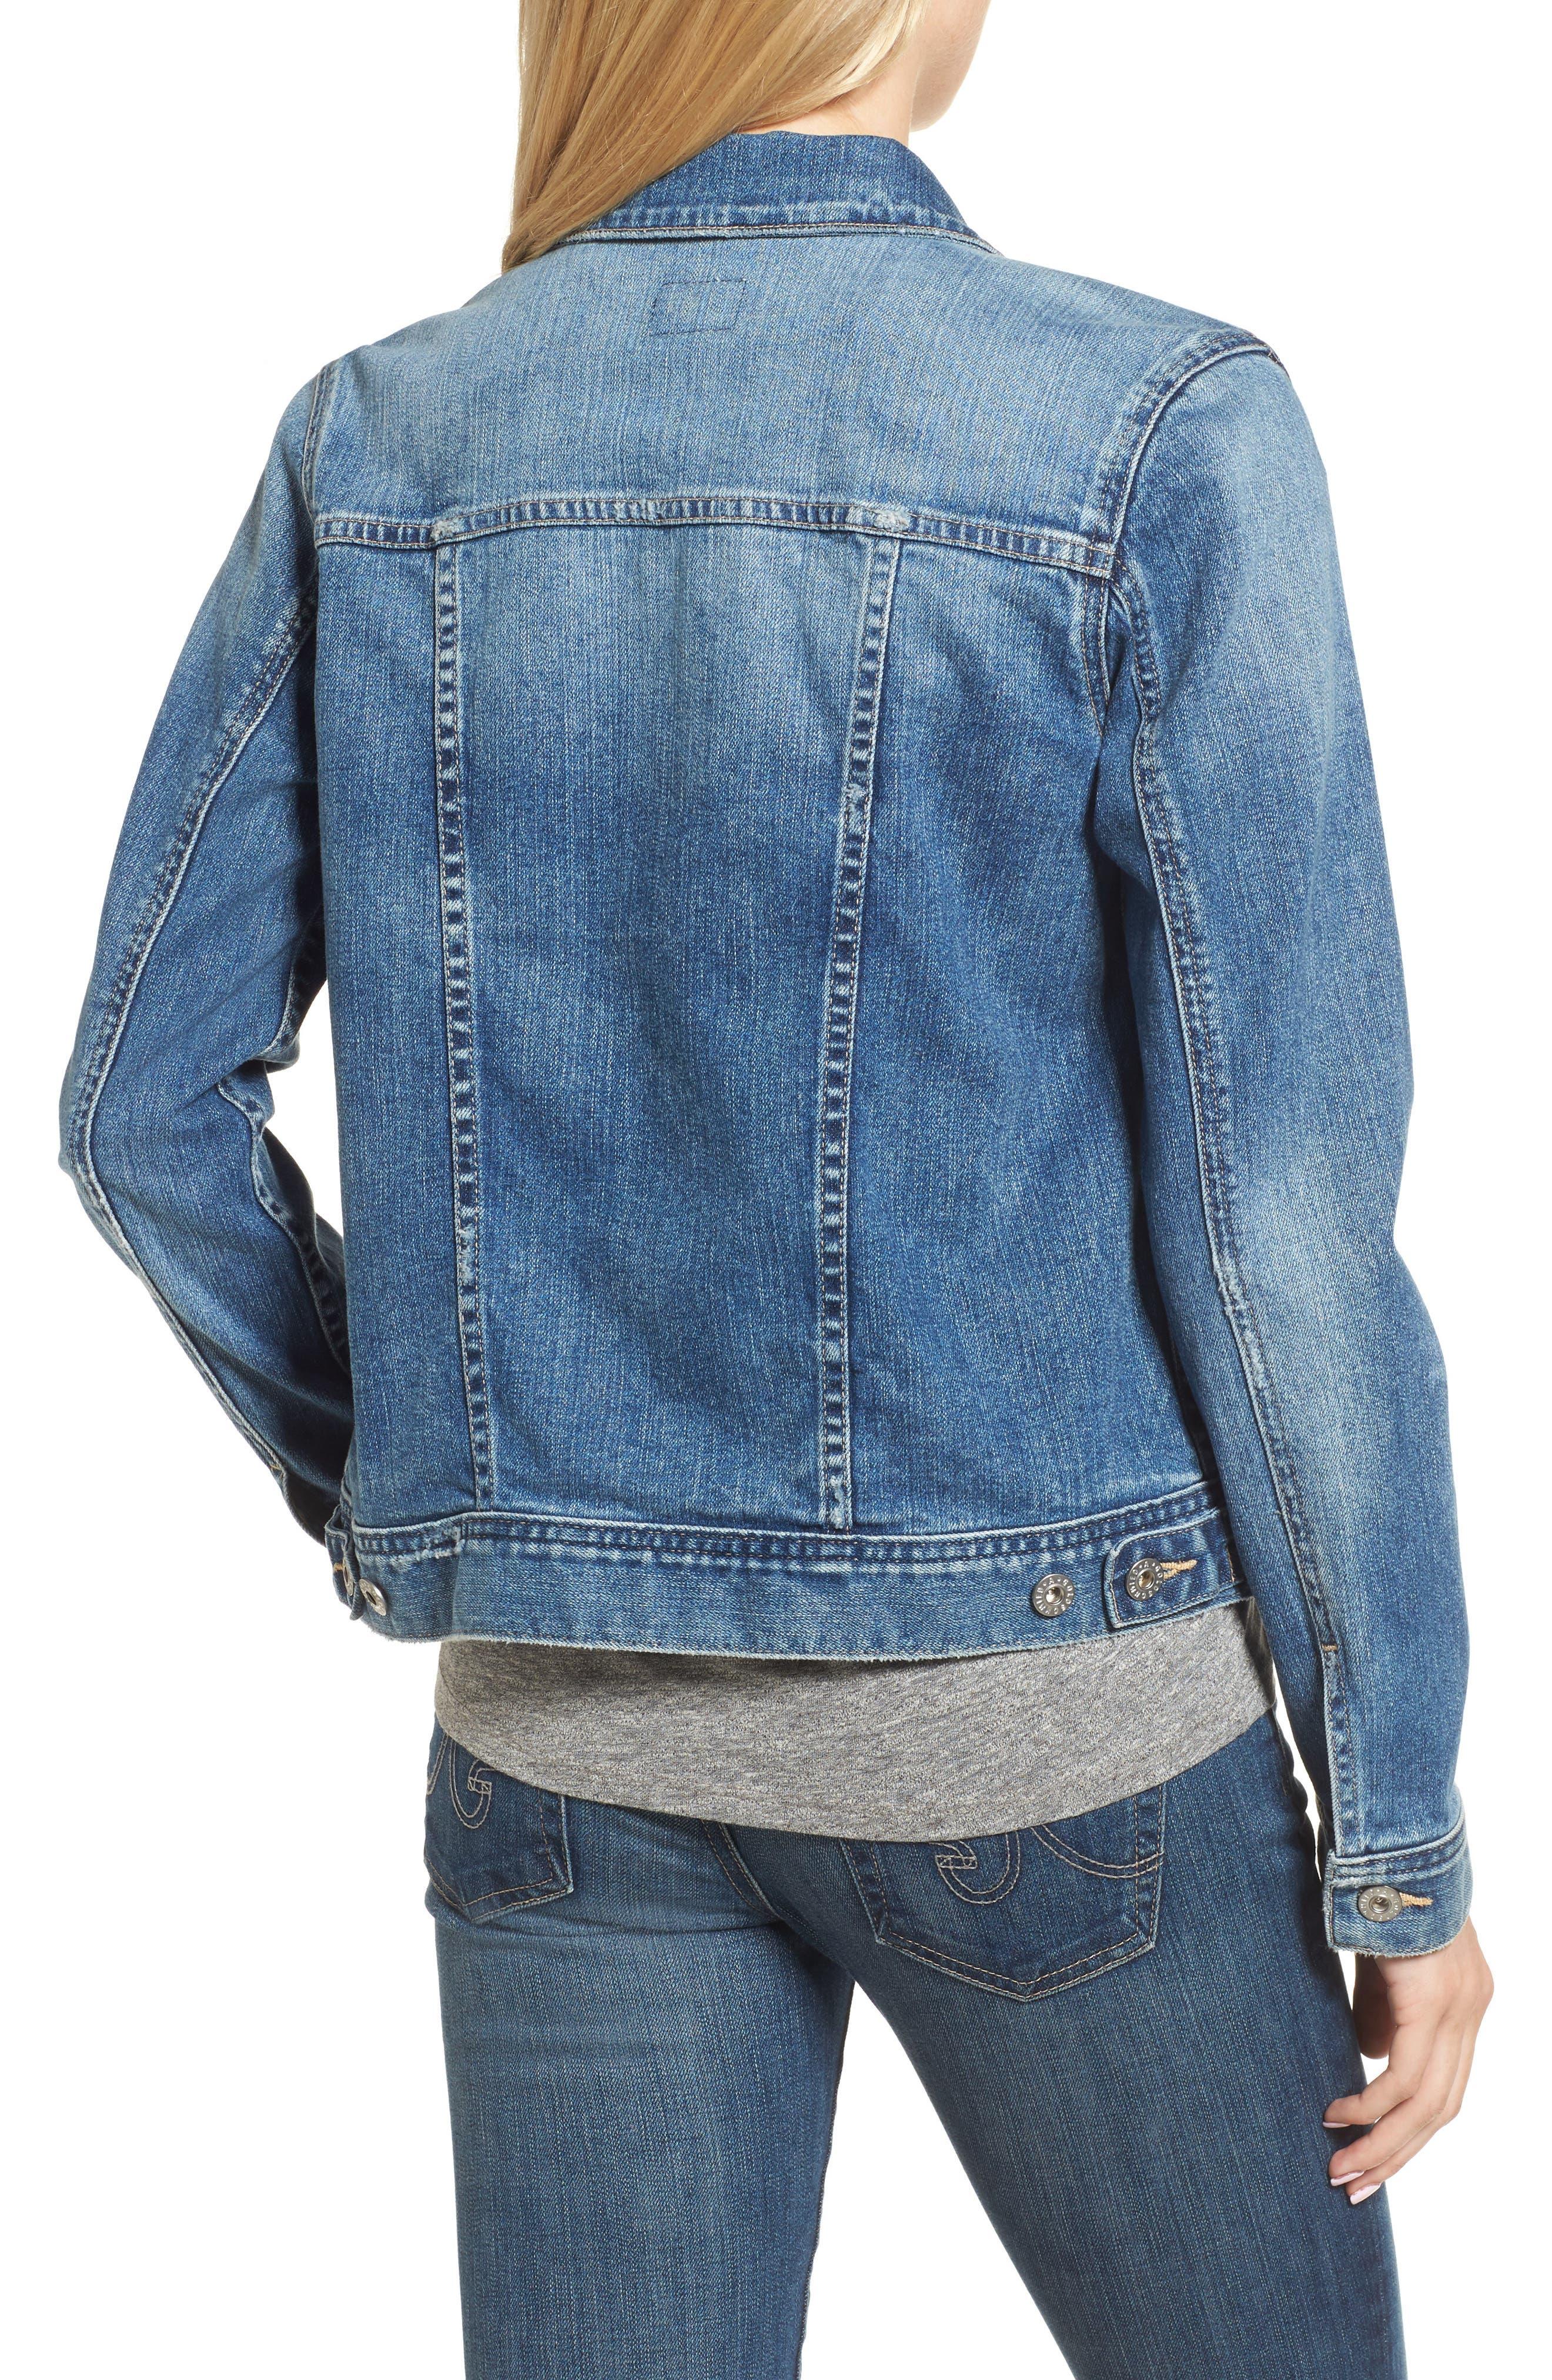 'Mya' Denim Jacket,                             Alternate thumbnail 2, color,                             10 Years Magnetic Blue